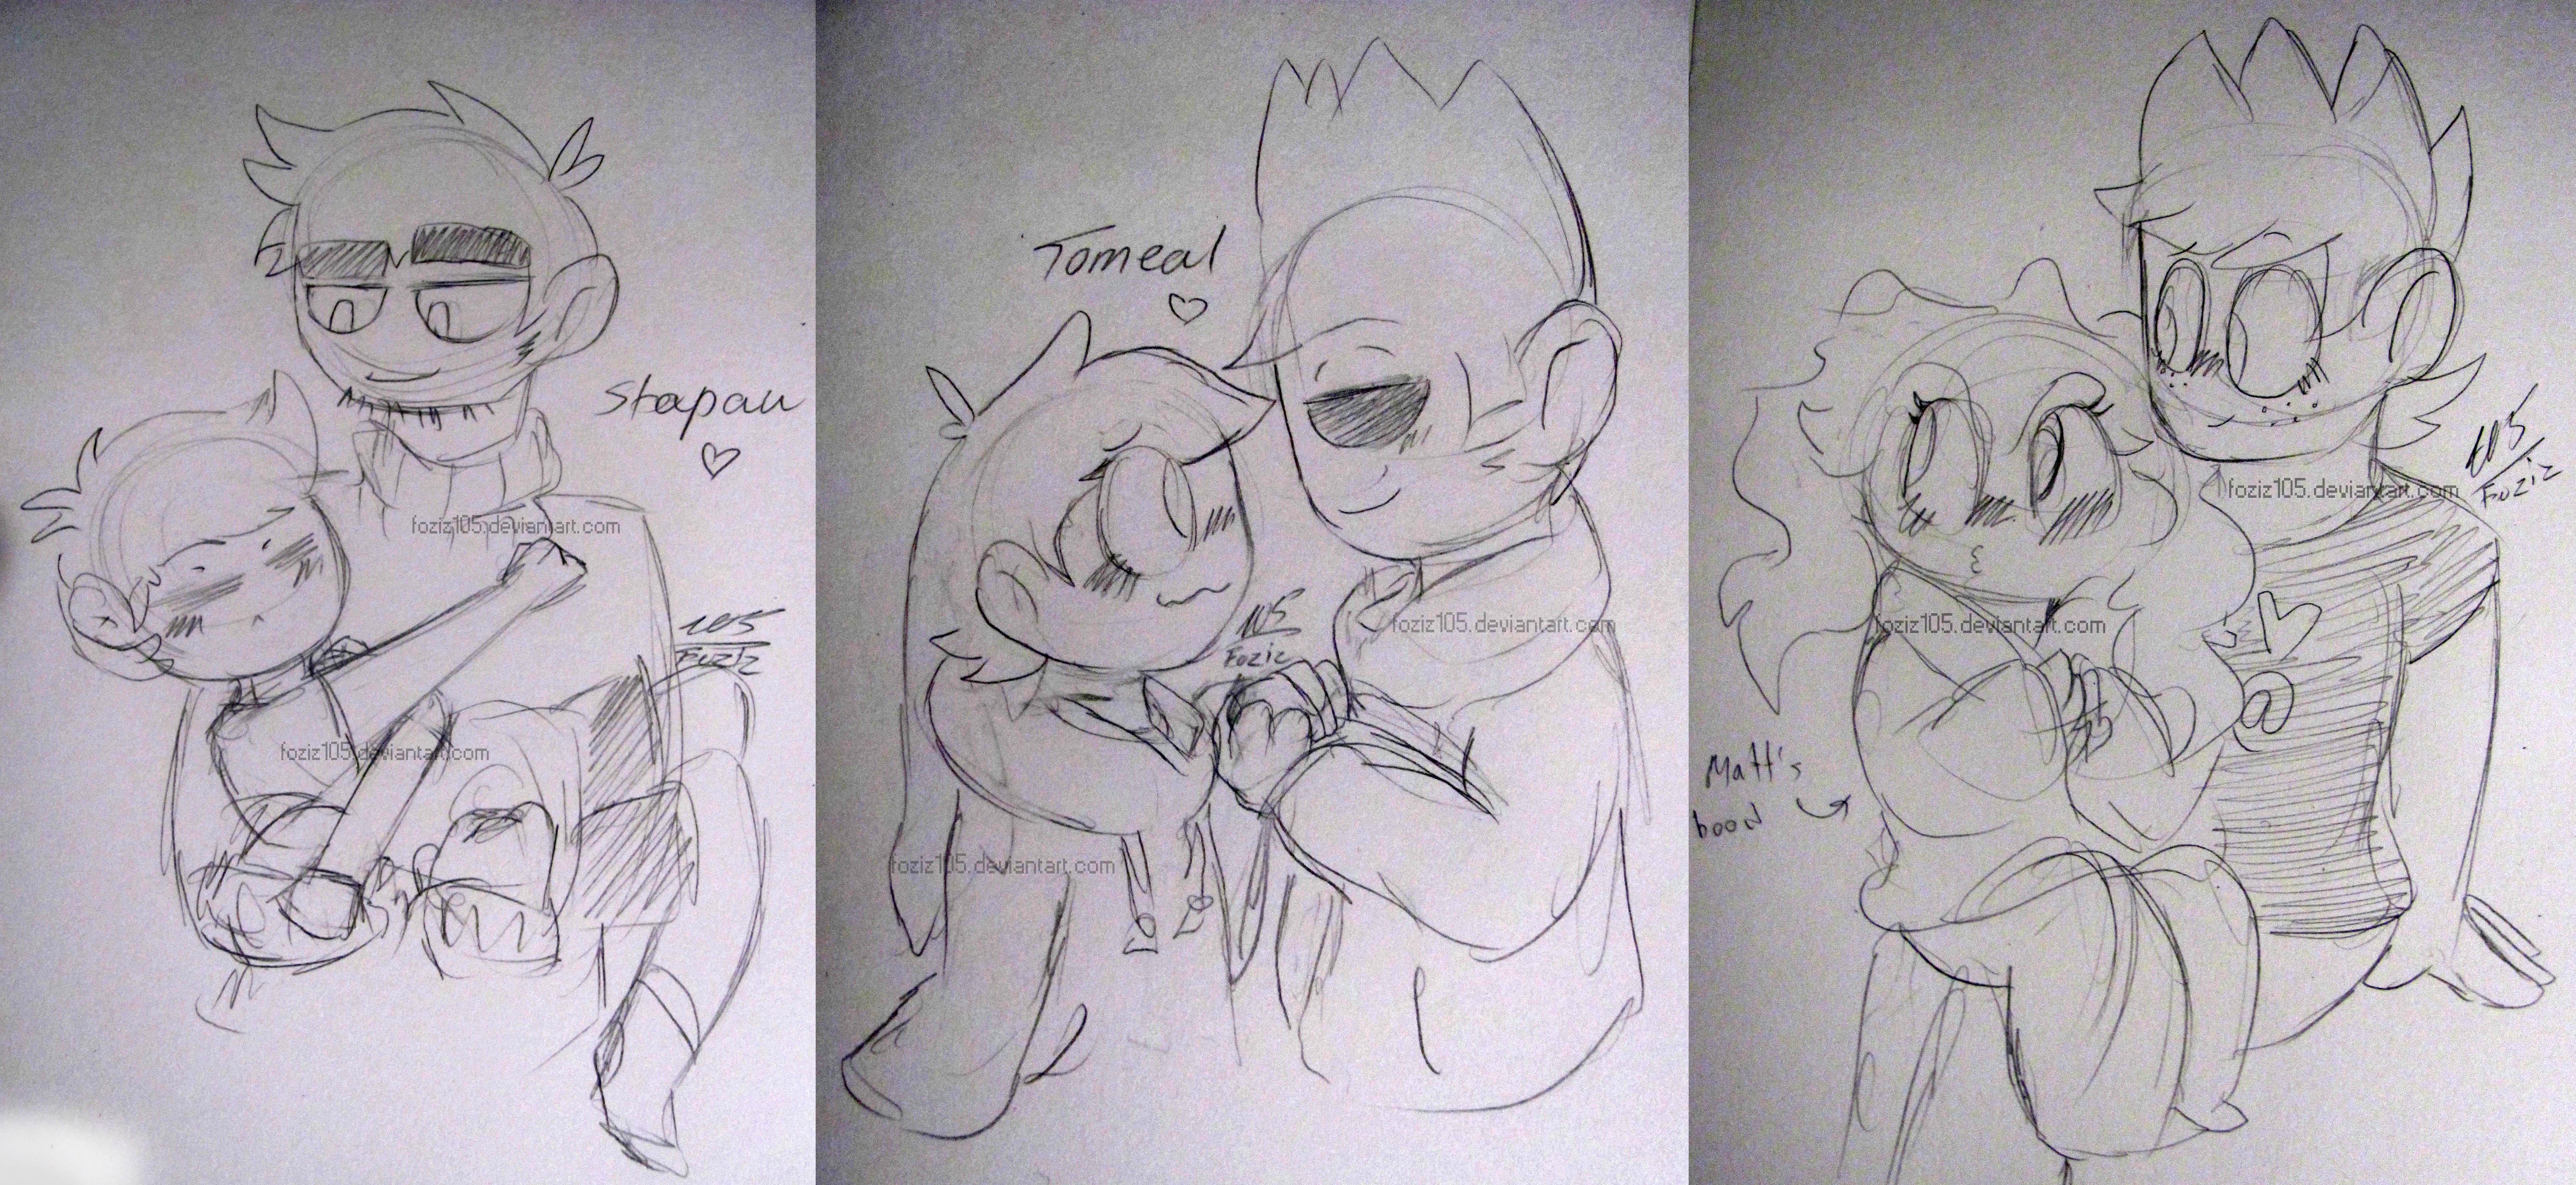 [Shipping Doodles] by Foziz105